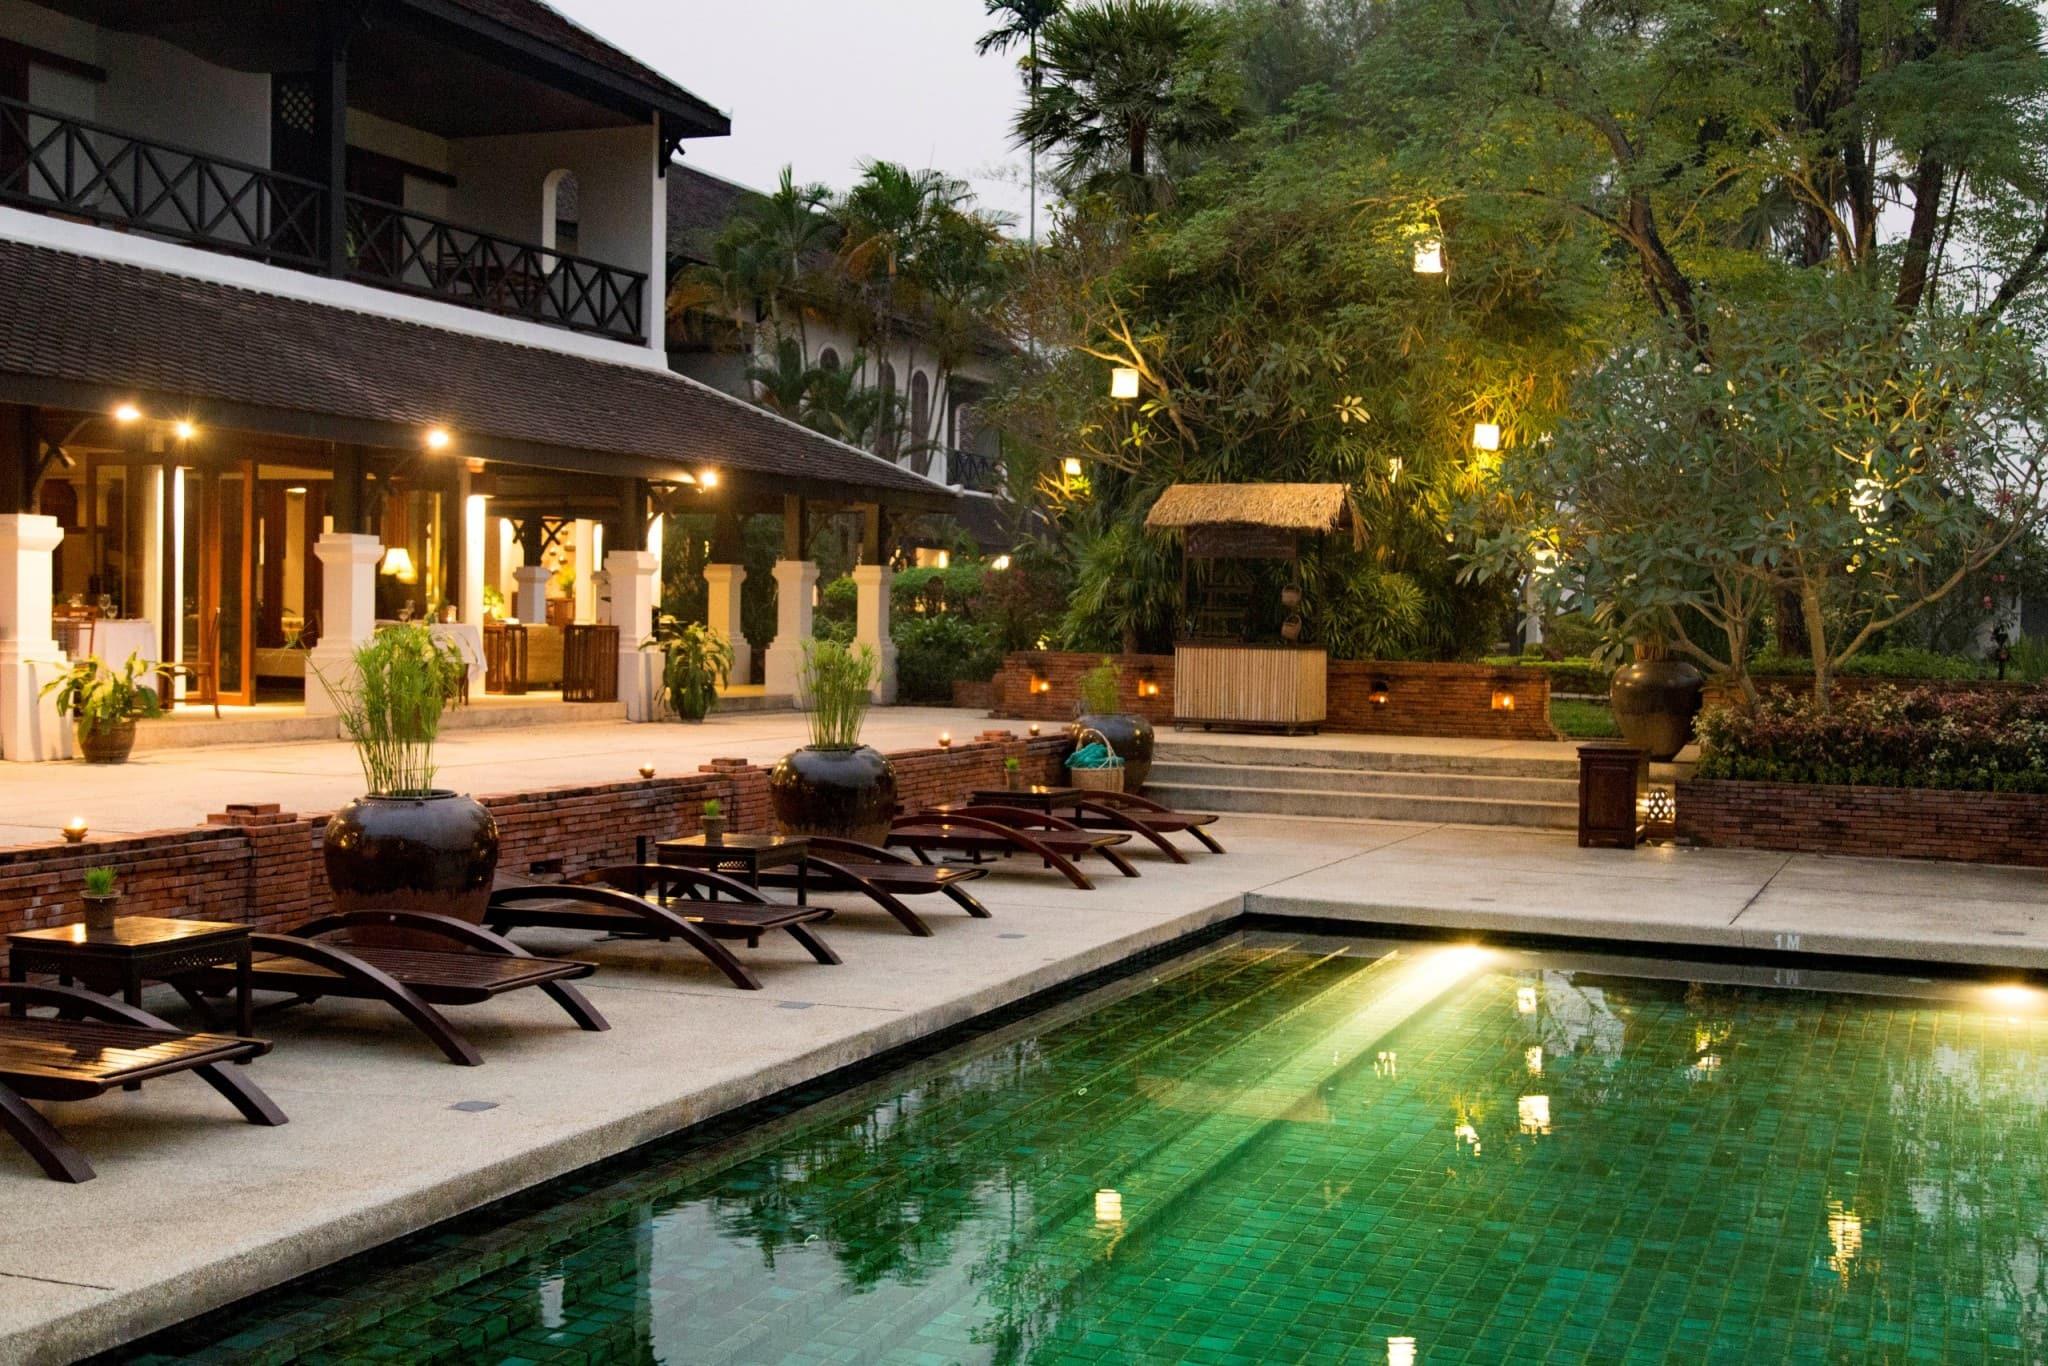 LAOS - Belmond Luang Prabang Residence Phou Vao: a garden resort where dreams come true